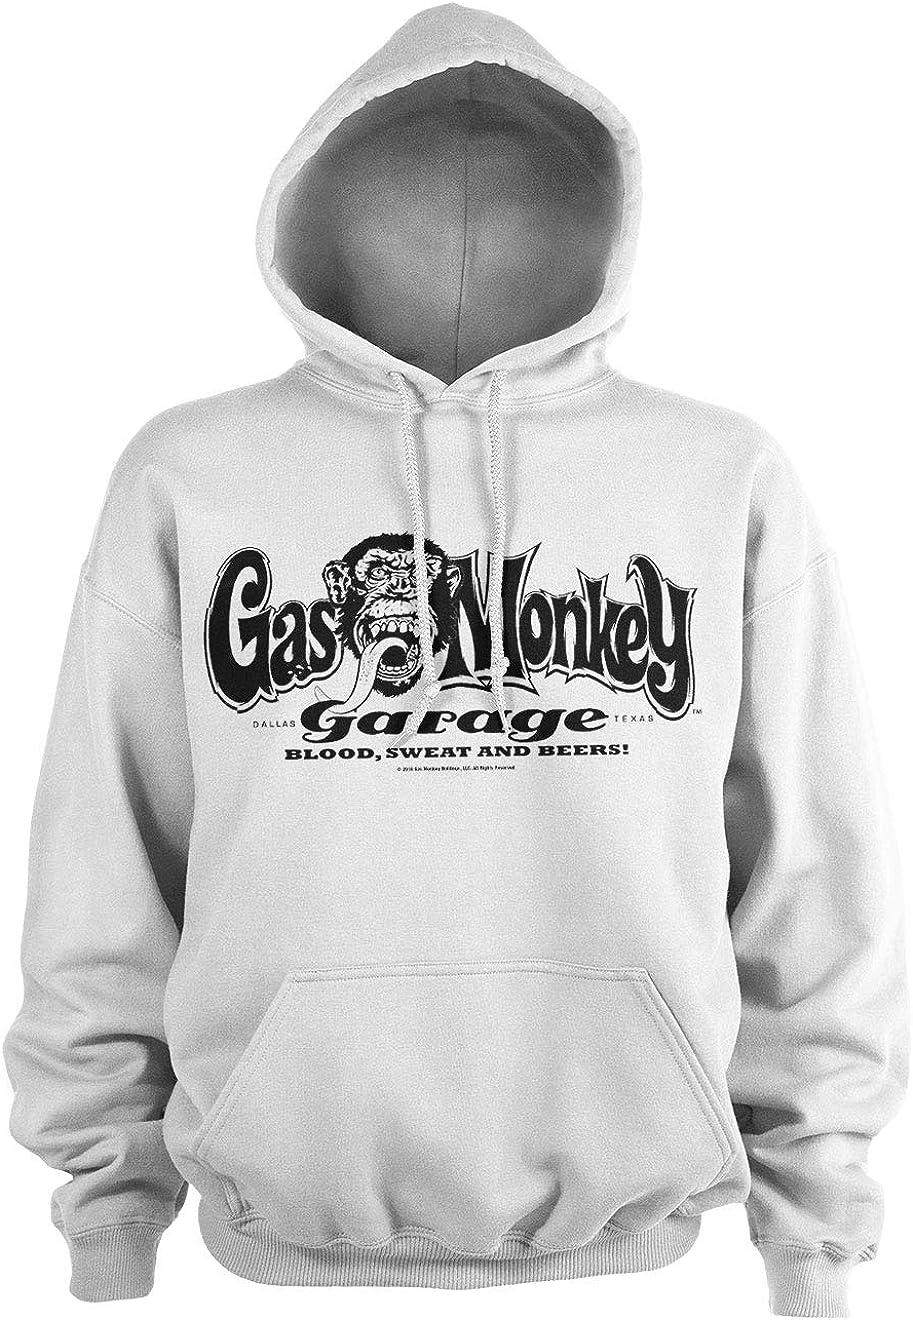 Gas Monkey Garage Officially Licensed Logo Hoodie